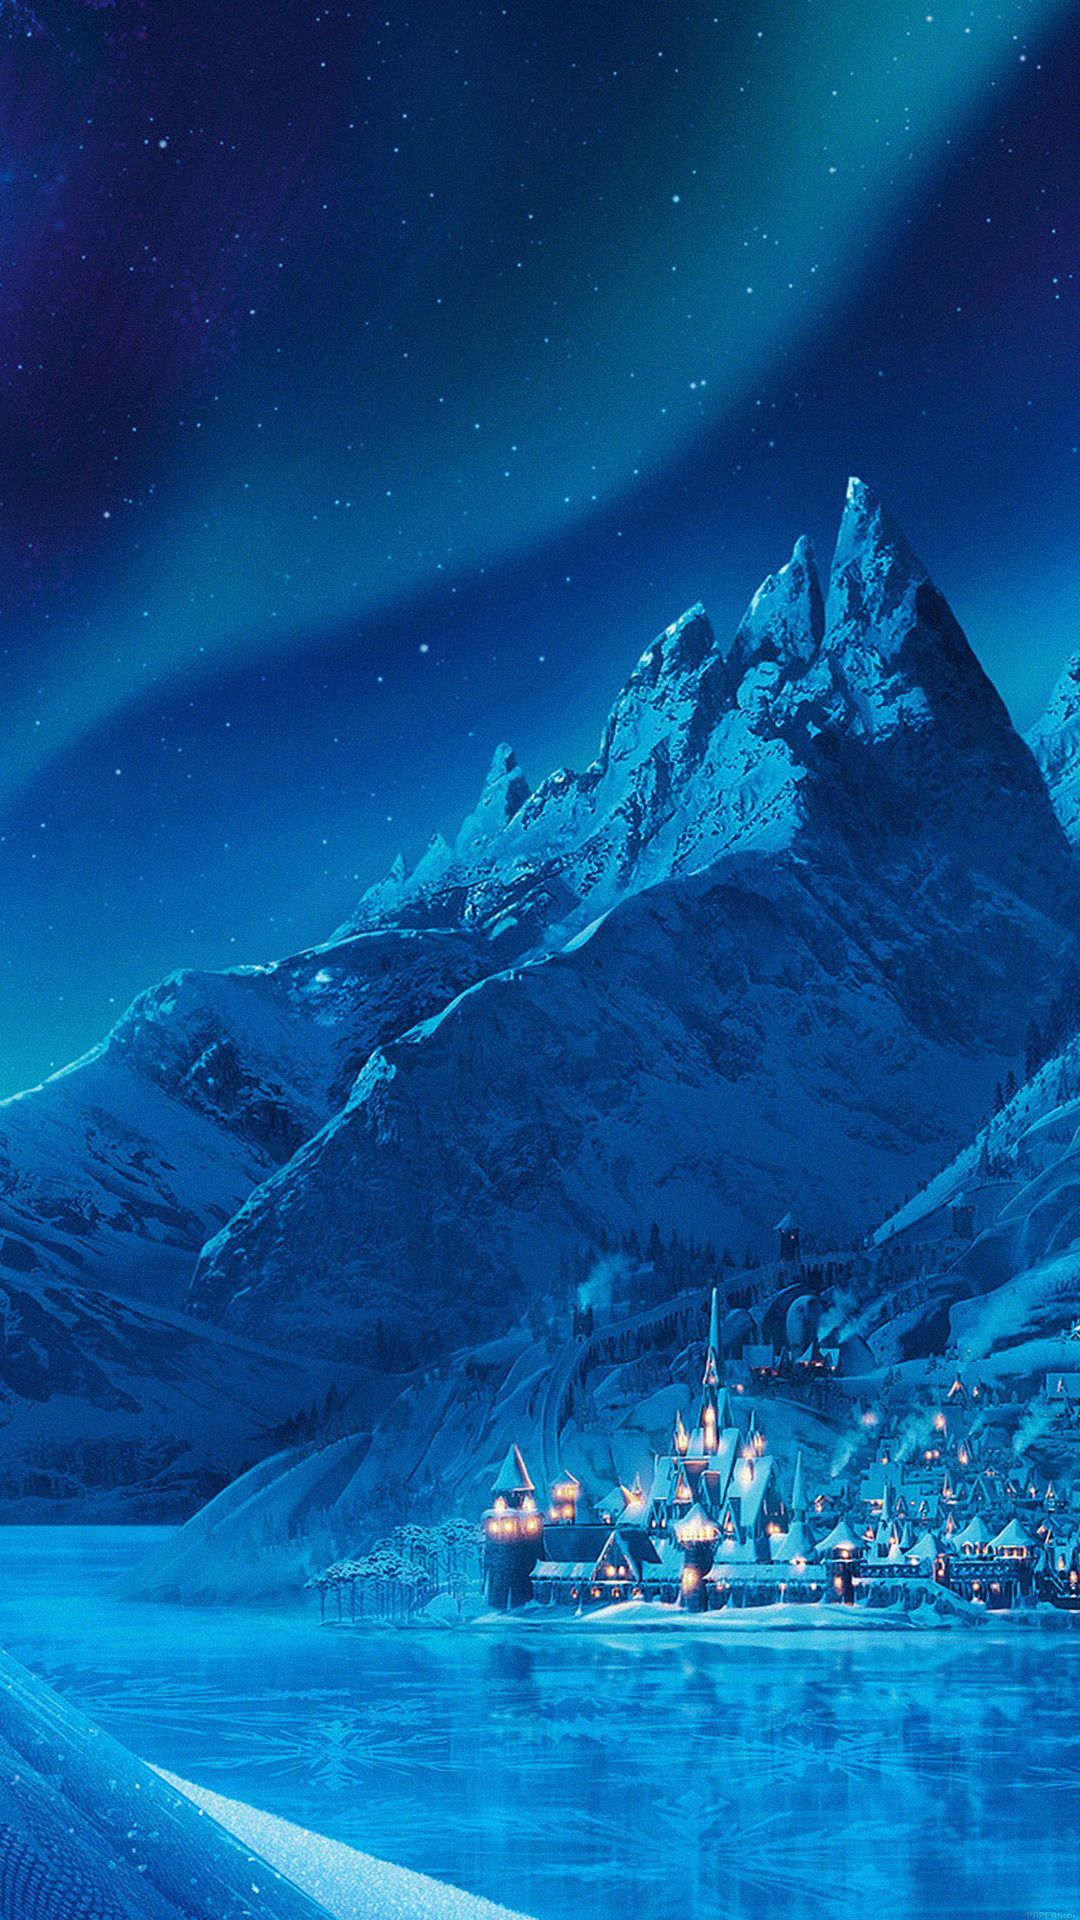 Tap image for more iPhone Disney wallpapers! Elsa Frozen